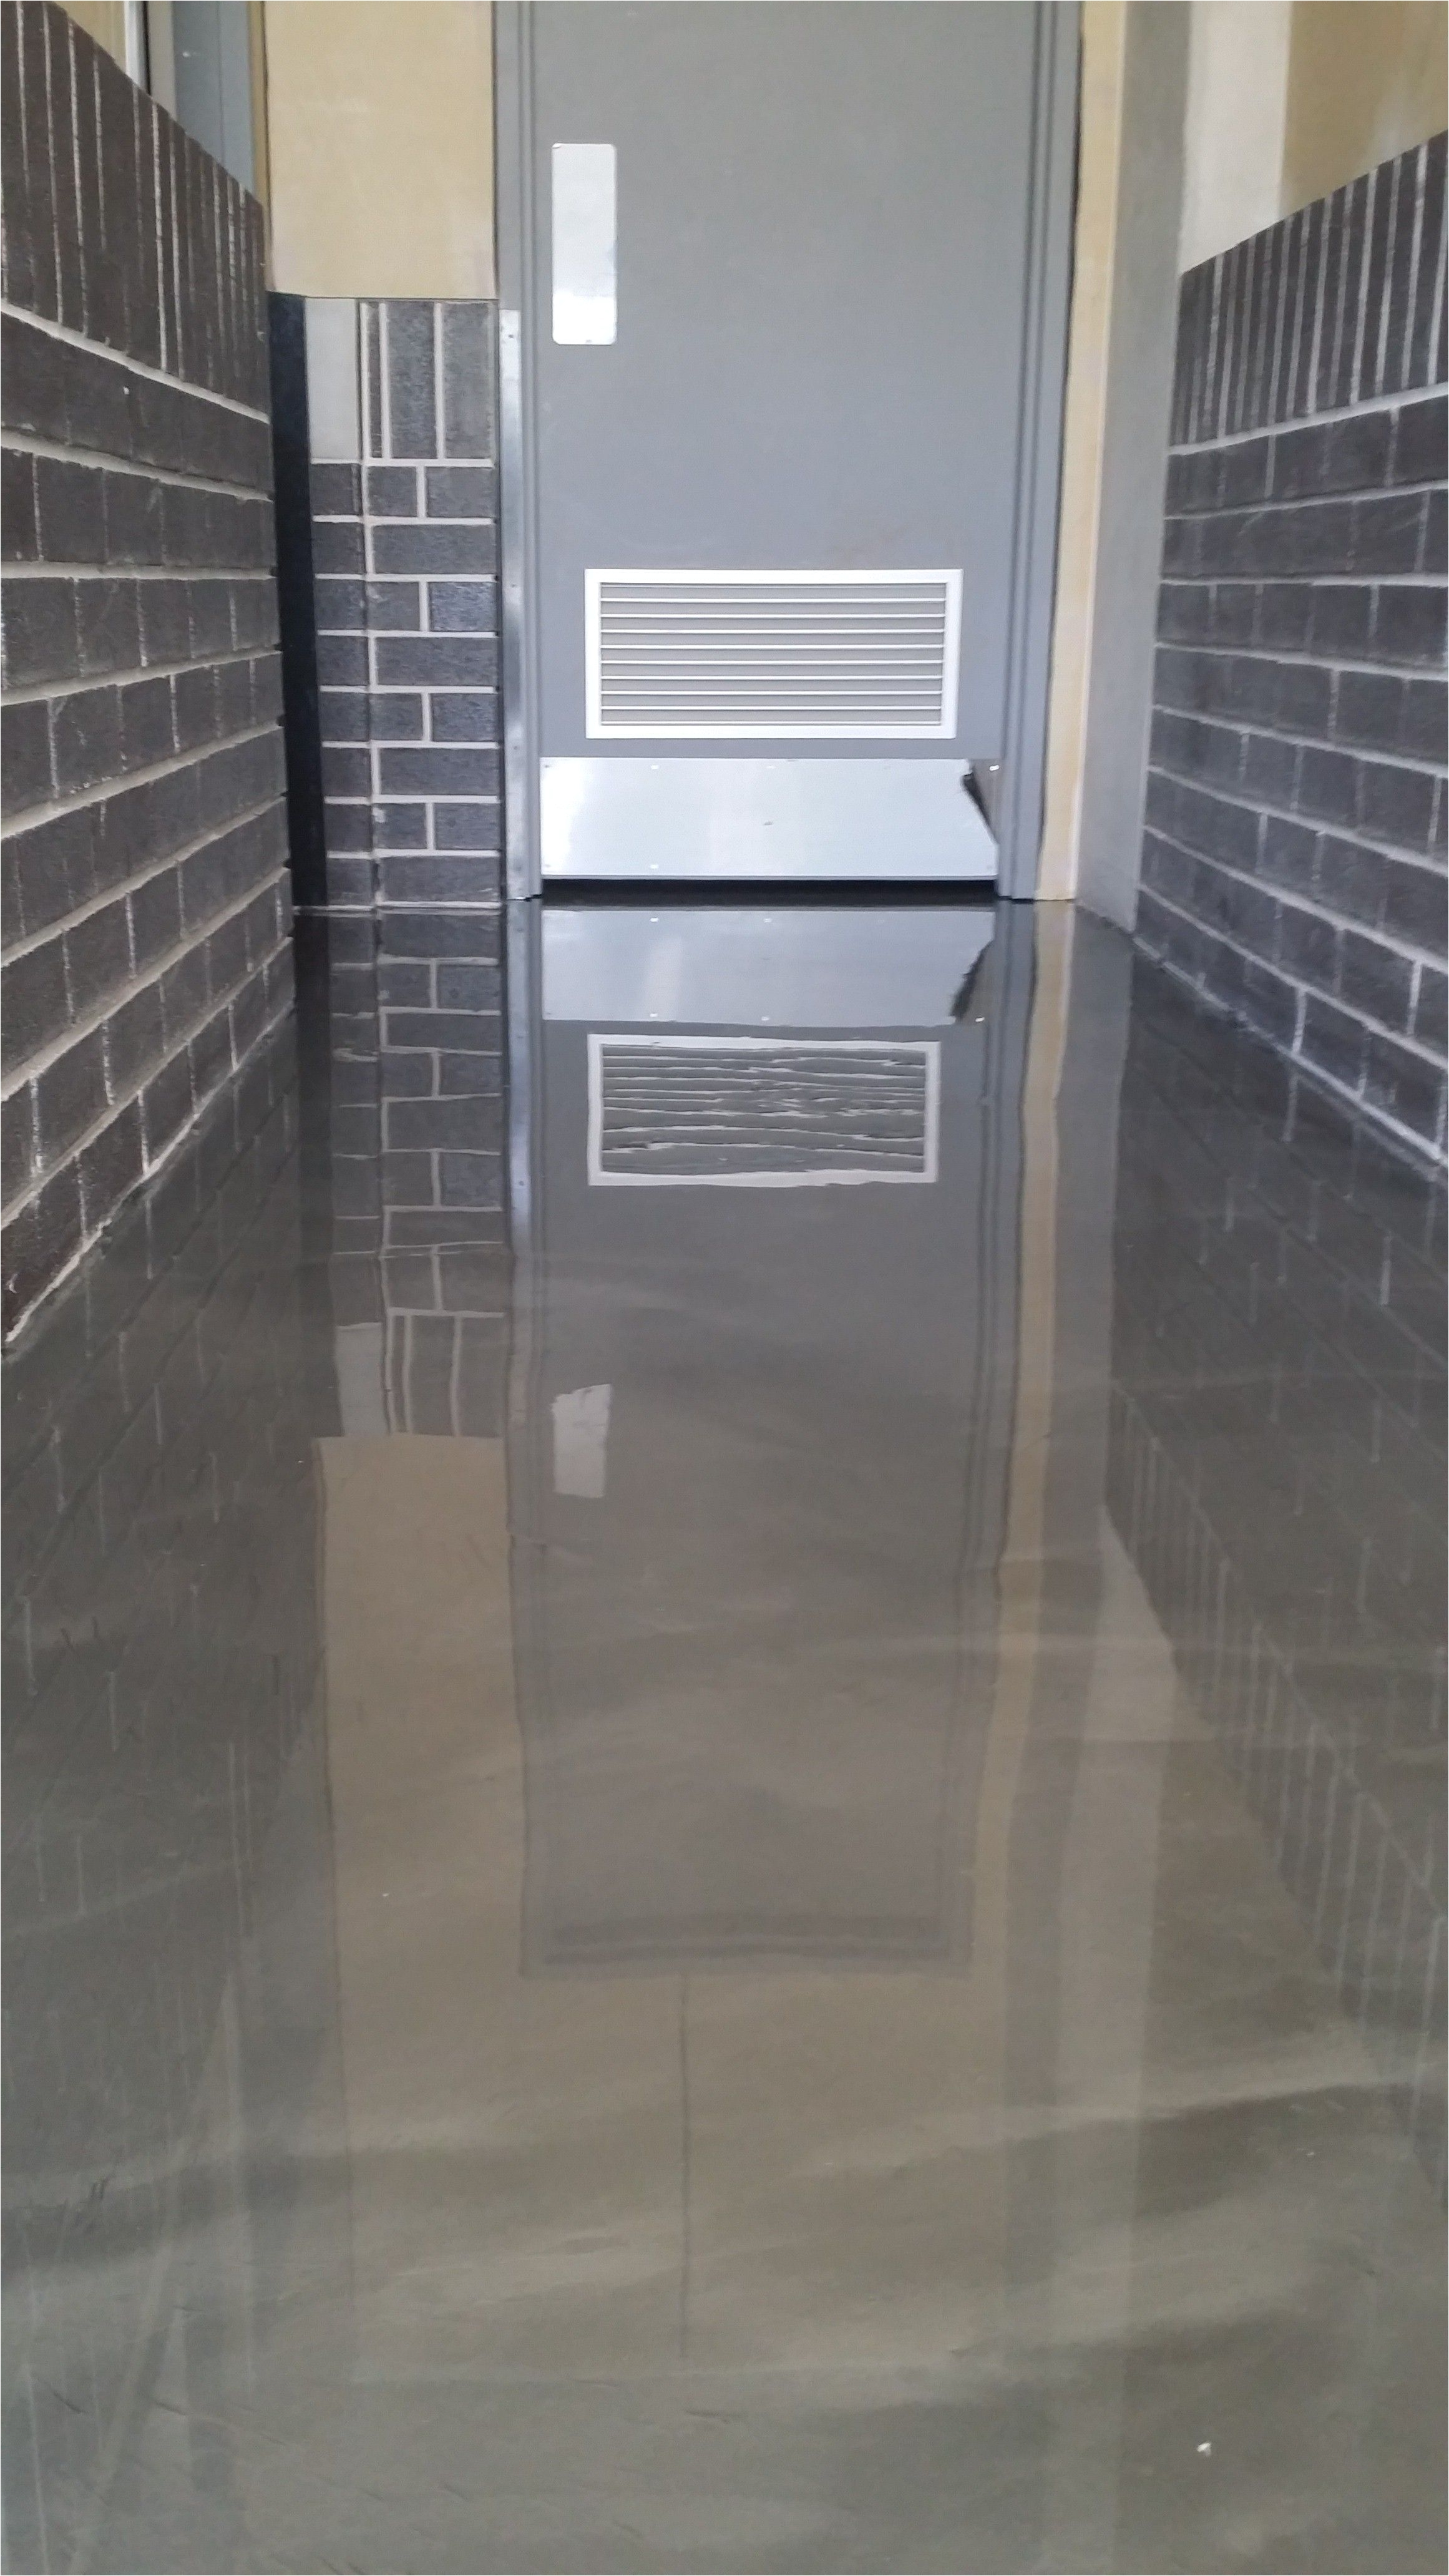 Sherwin Williams Epoxy Basement Floor Paint Childcare Centre toilet Entry area Projects Pinterest